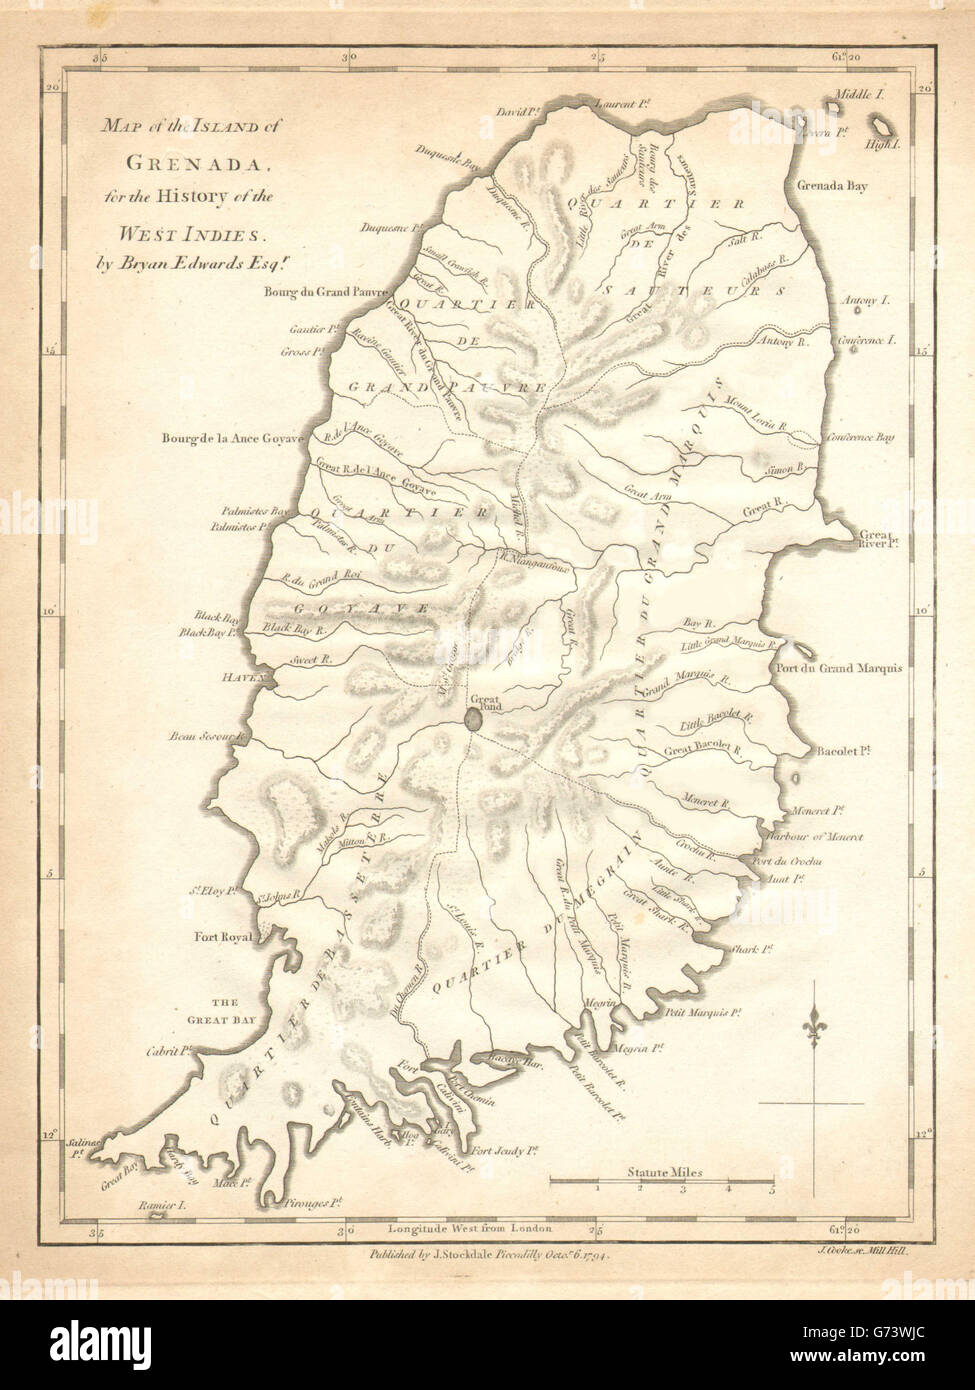 Map Of Grenada Caribbean Islands San Diego Neighborhood Map - Map of grenada caribbean islands